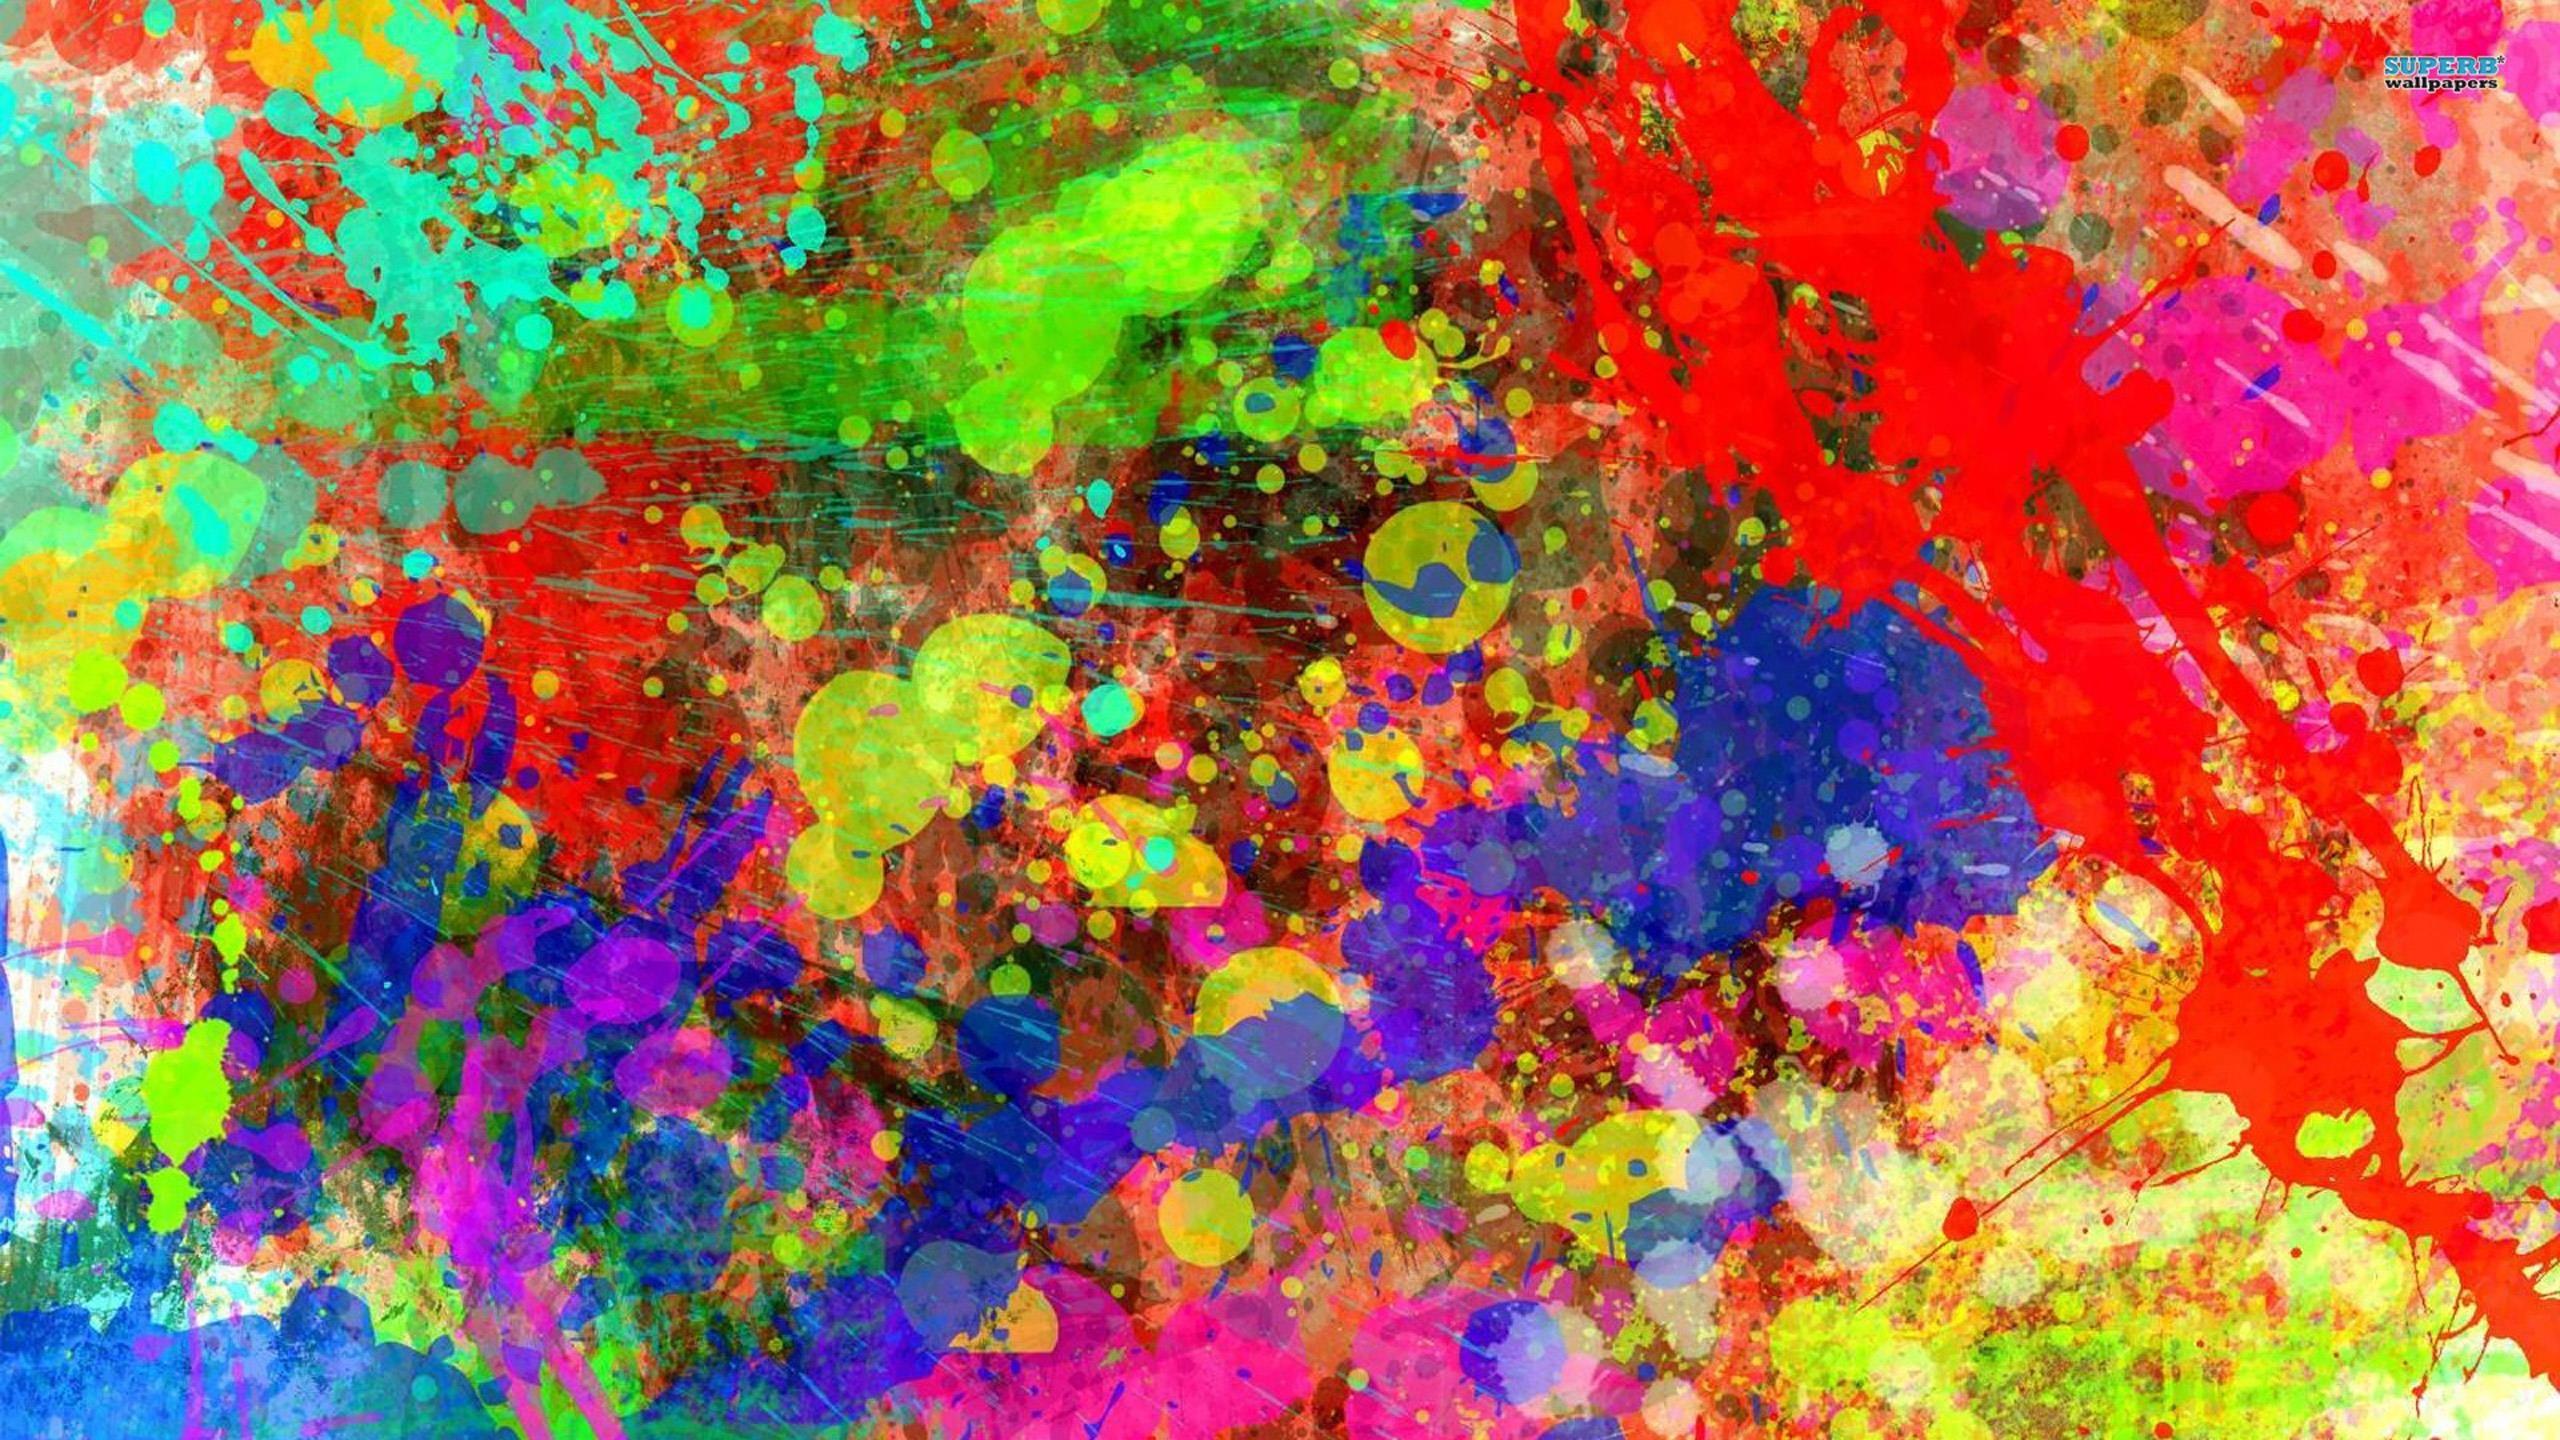 Res: 2560x1440, Rainbow Pattern Color Splash Background Wallpaper. Download Image